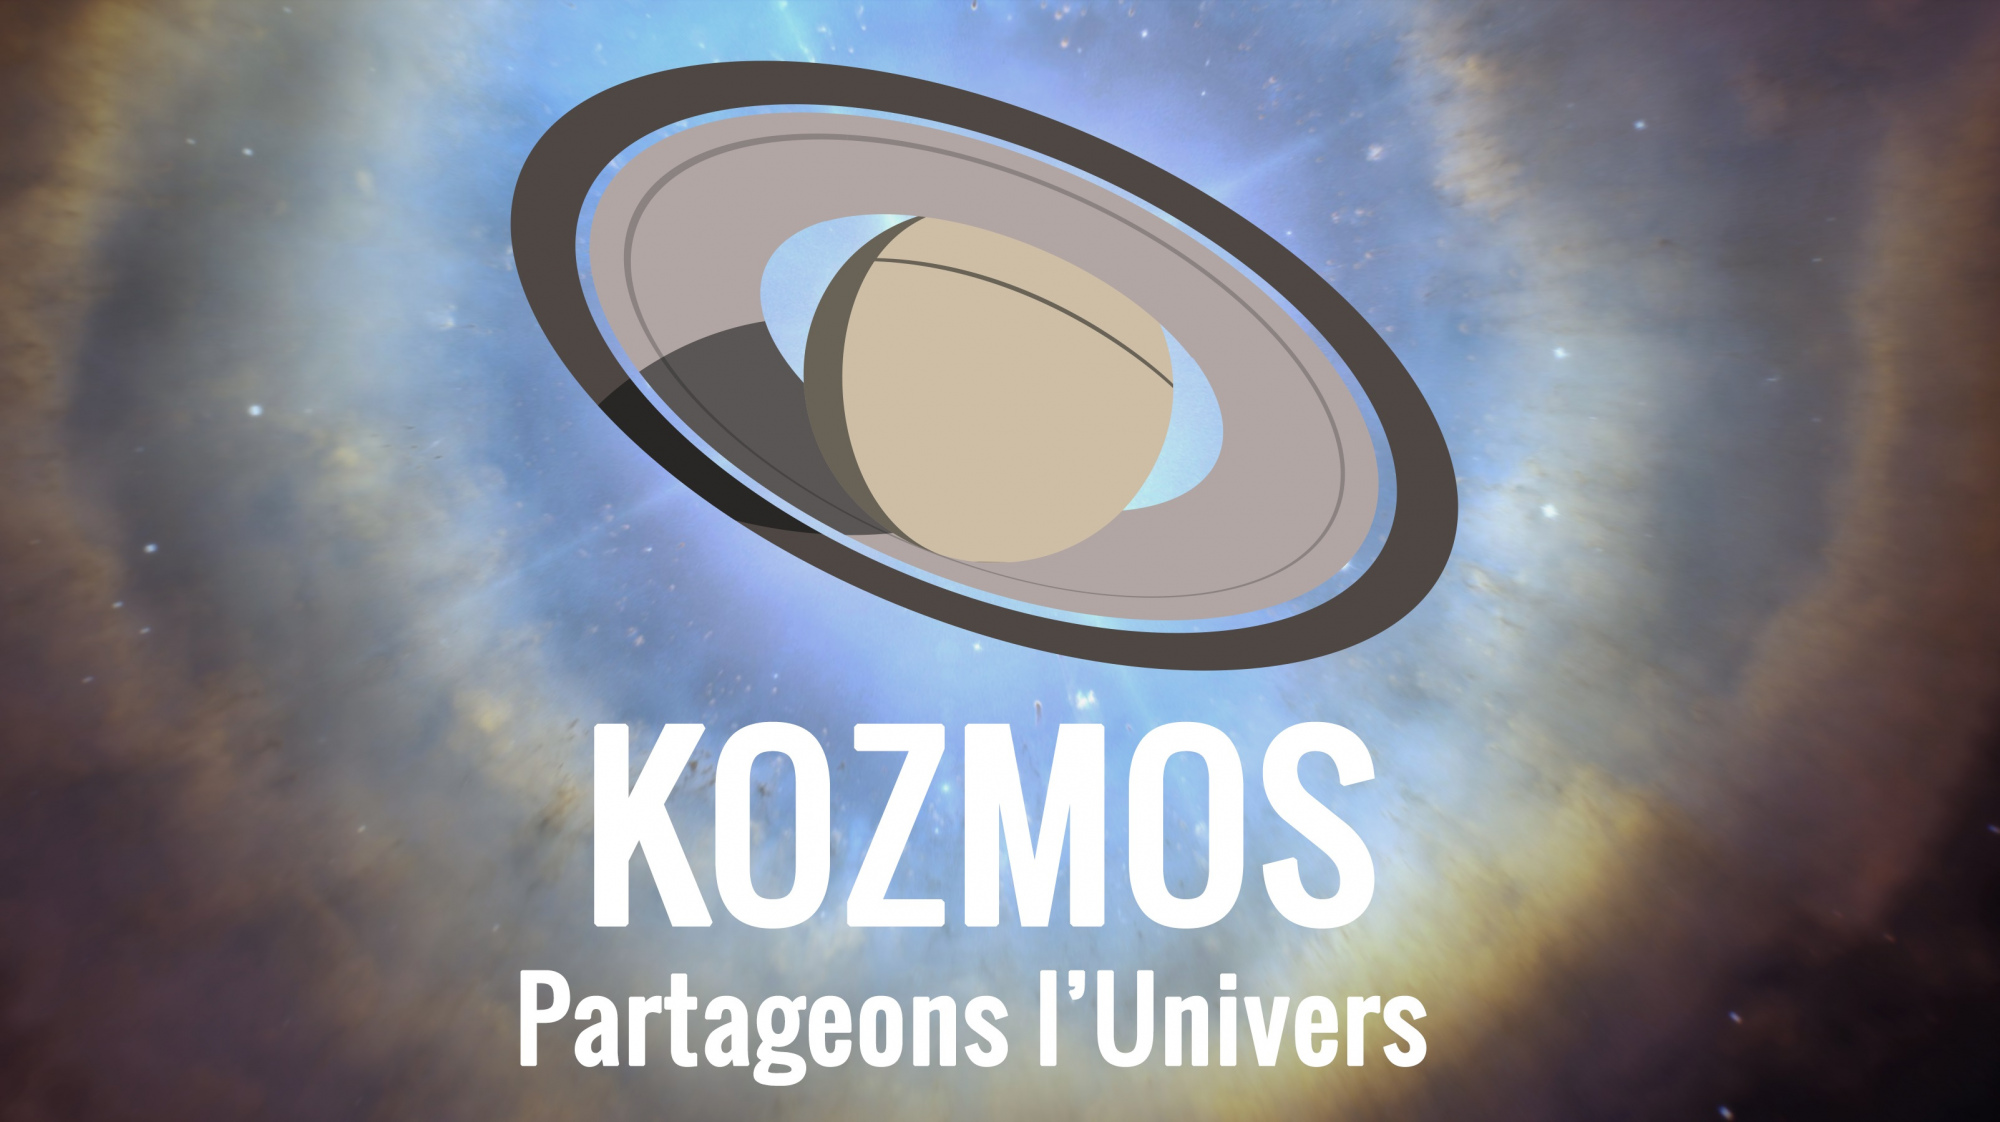 KOZMOS - Image de présentation